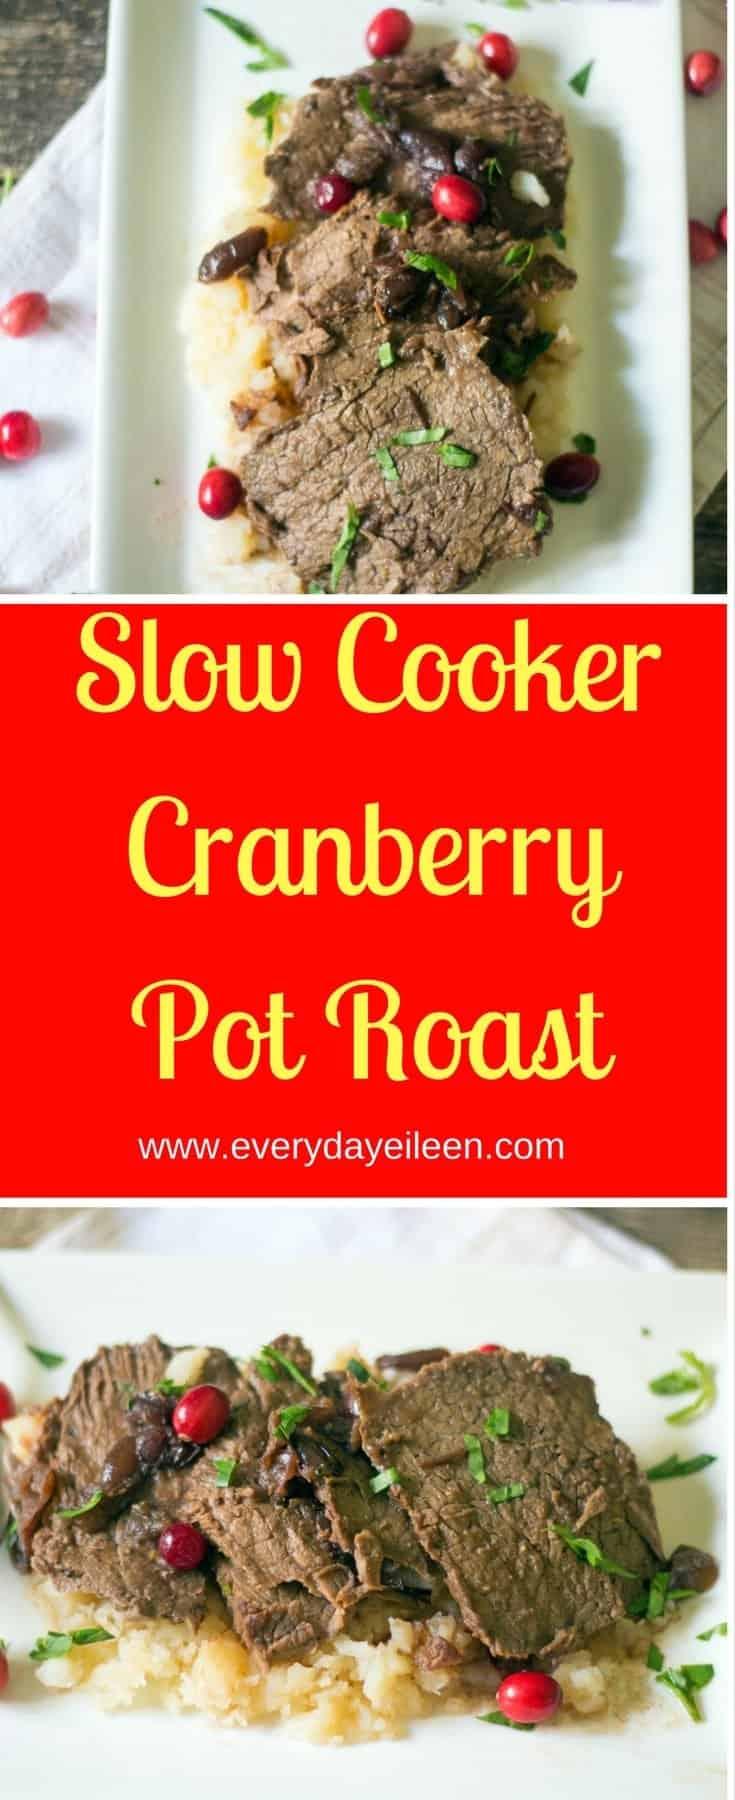 Slow Cooker Cranberry Pot Roast | Everyday Eileen